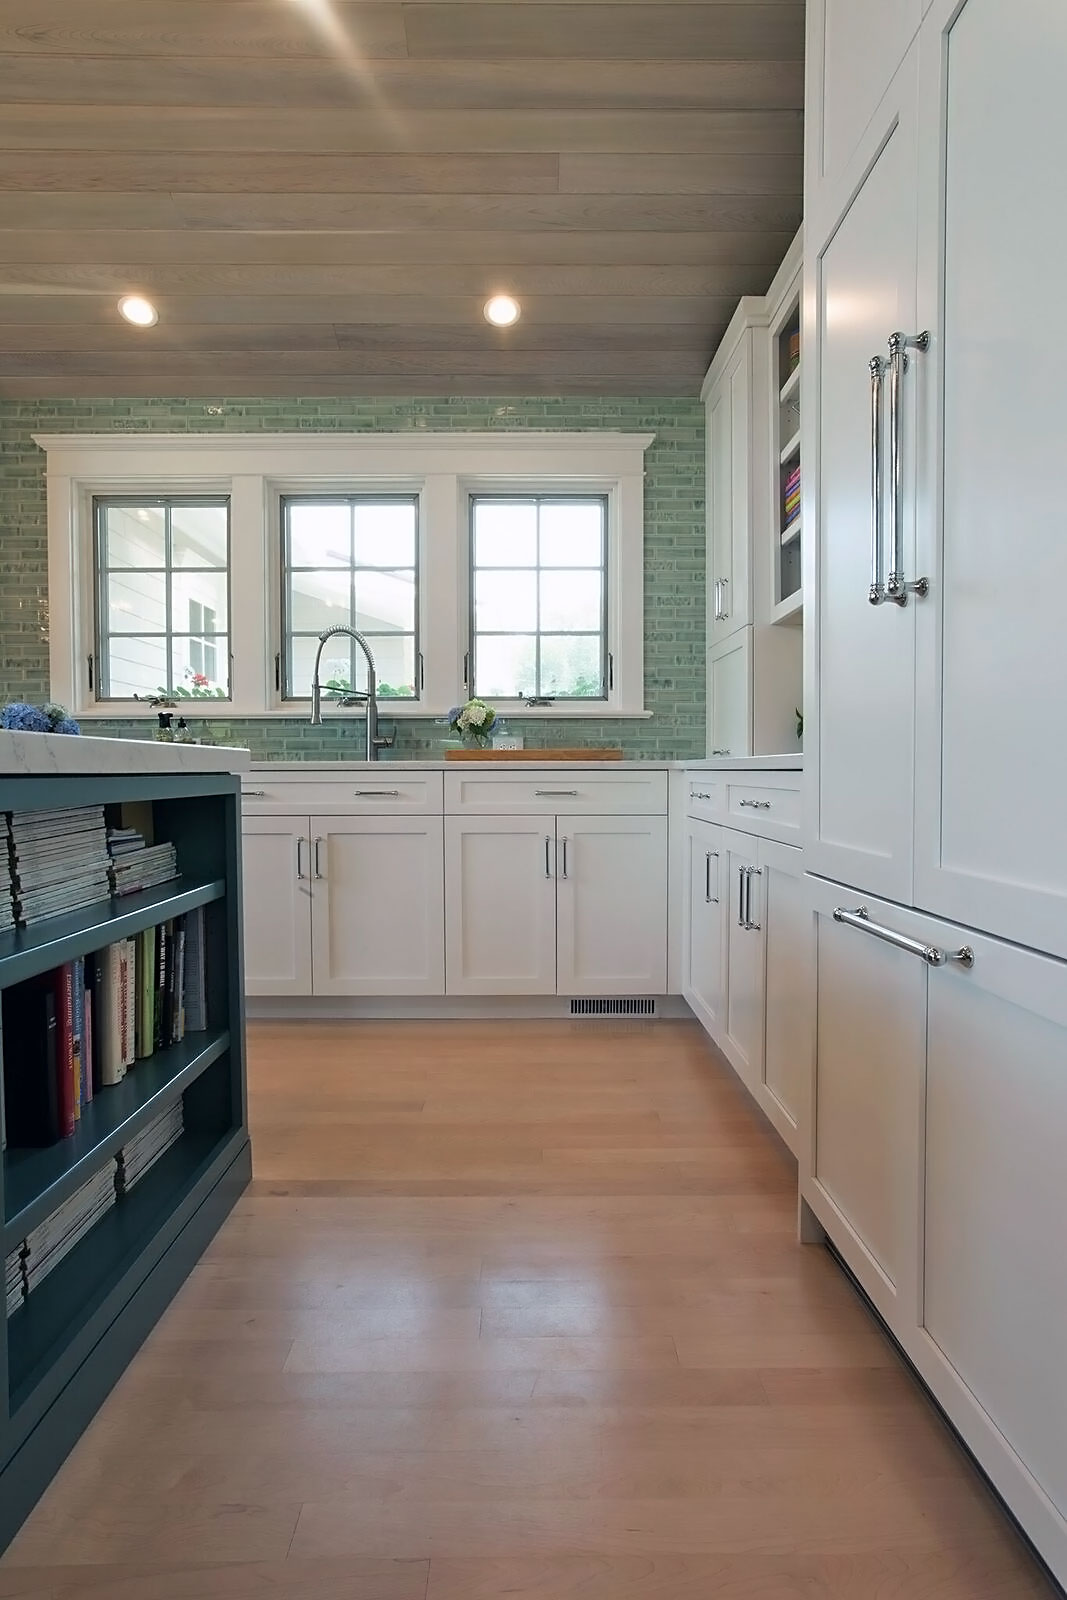 Stephen-Sullivan-Inc-Custom-Home-Builders-Rhode-Island-Narrow-River-Cottage---16